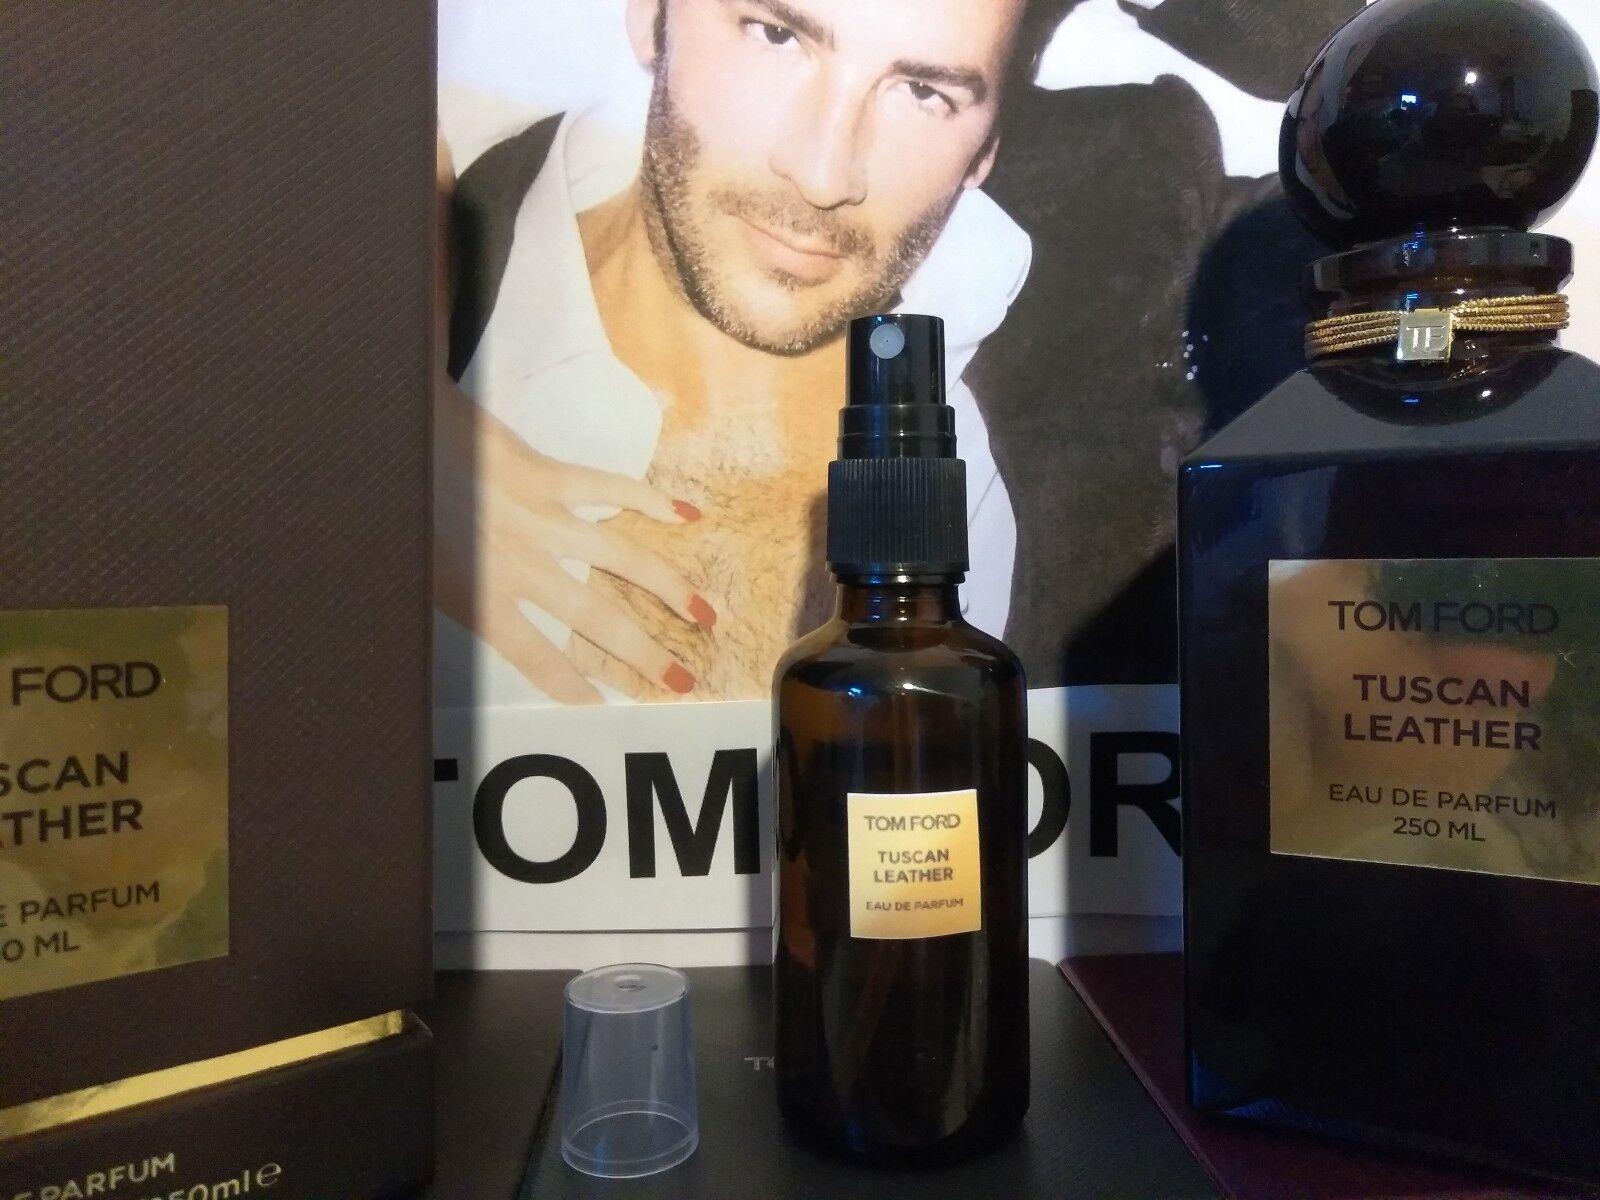 Tom Ford Echt Shanghai Lilie Private Blend Edp 50ml 50ml 30ml Spray Parfum